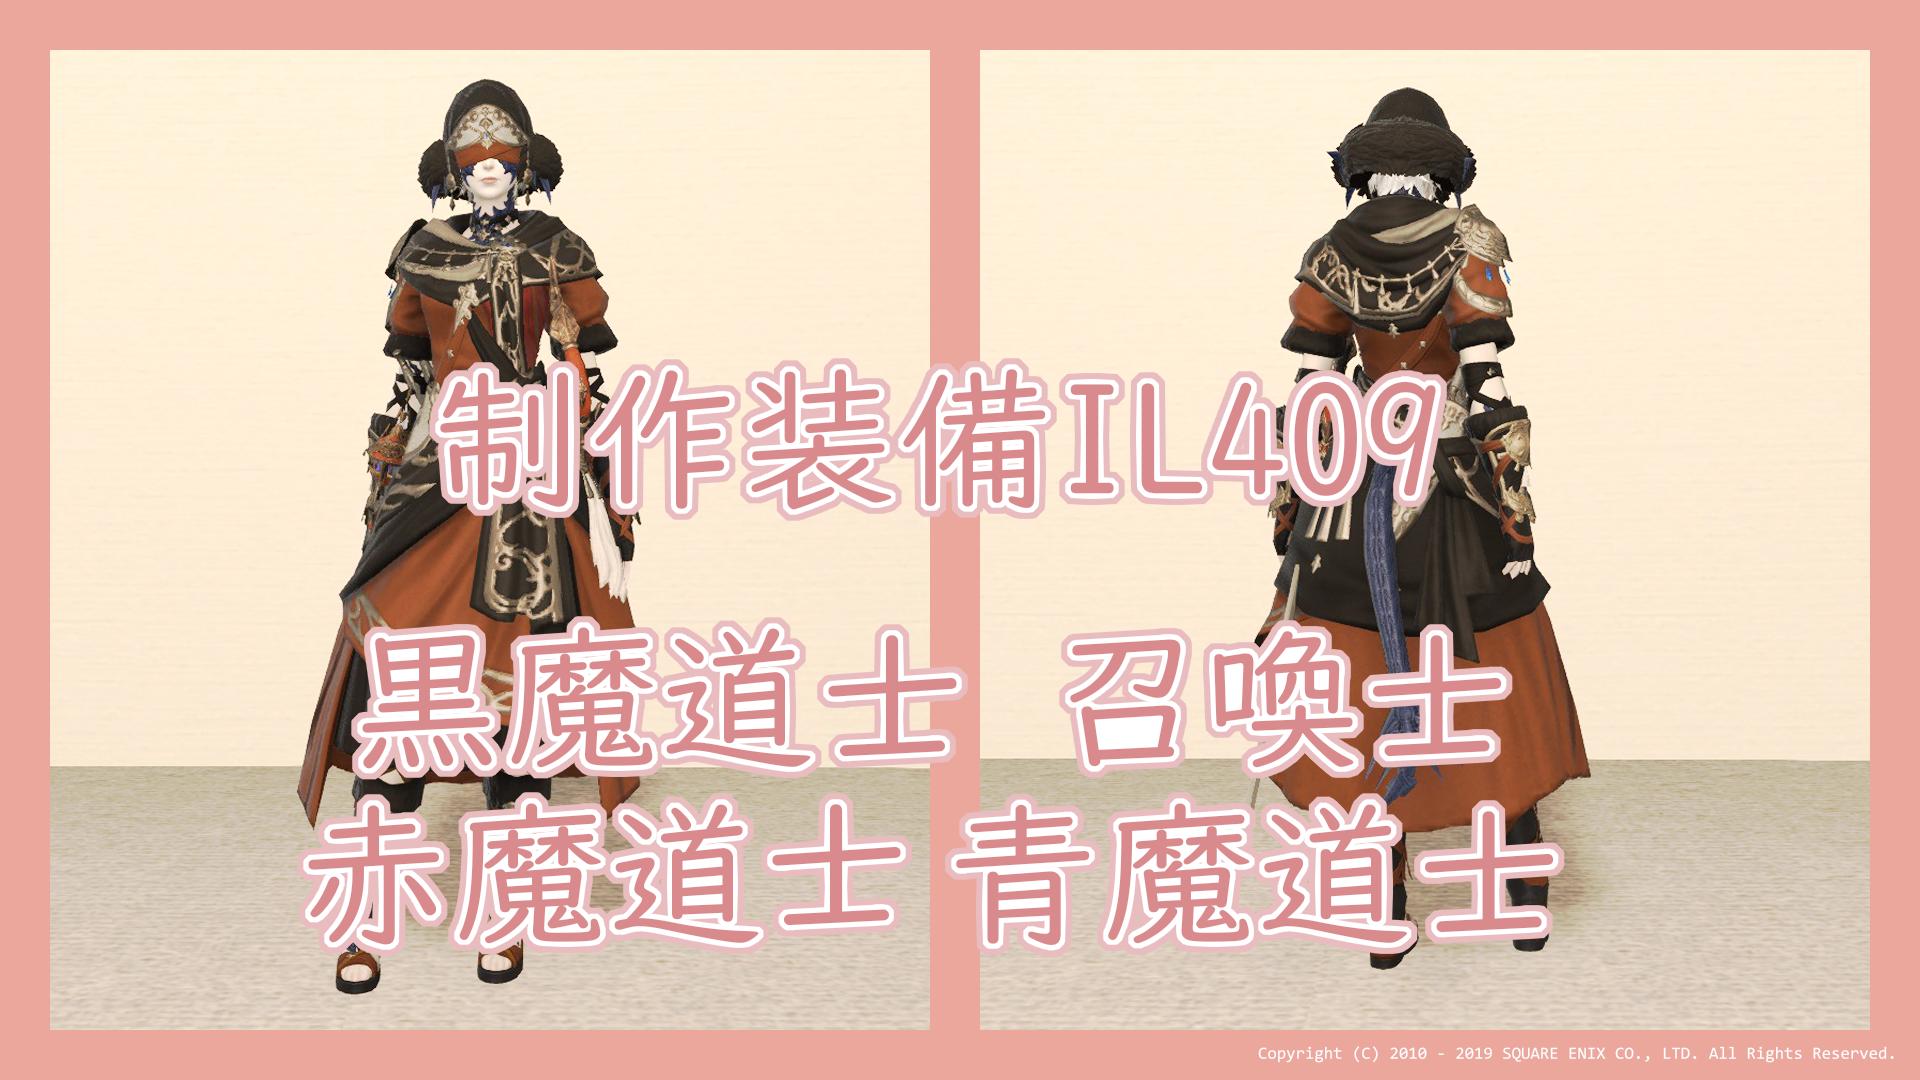 【FF14】 制作装備IL409【黒召赤青】